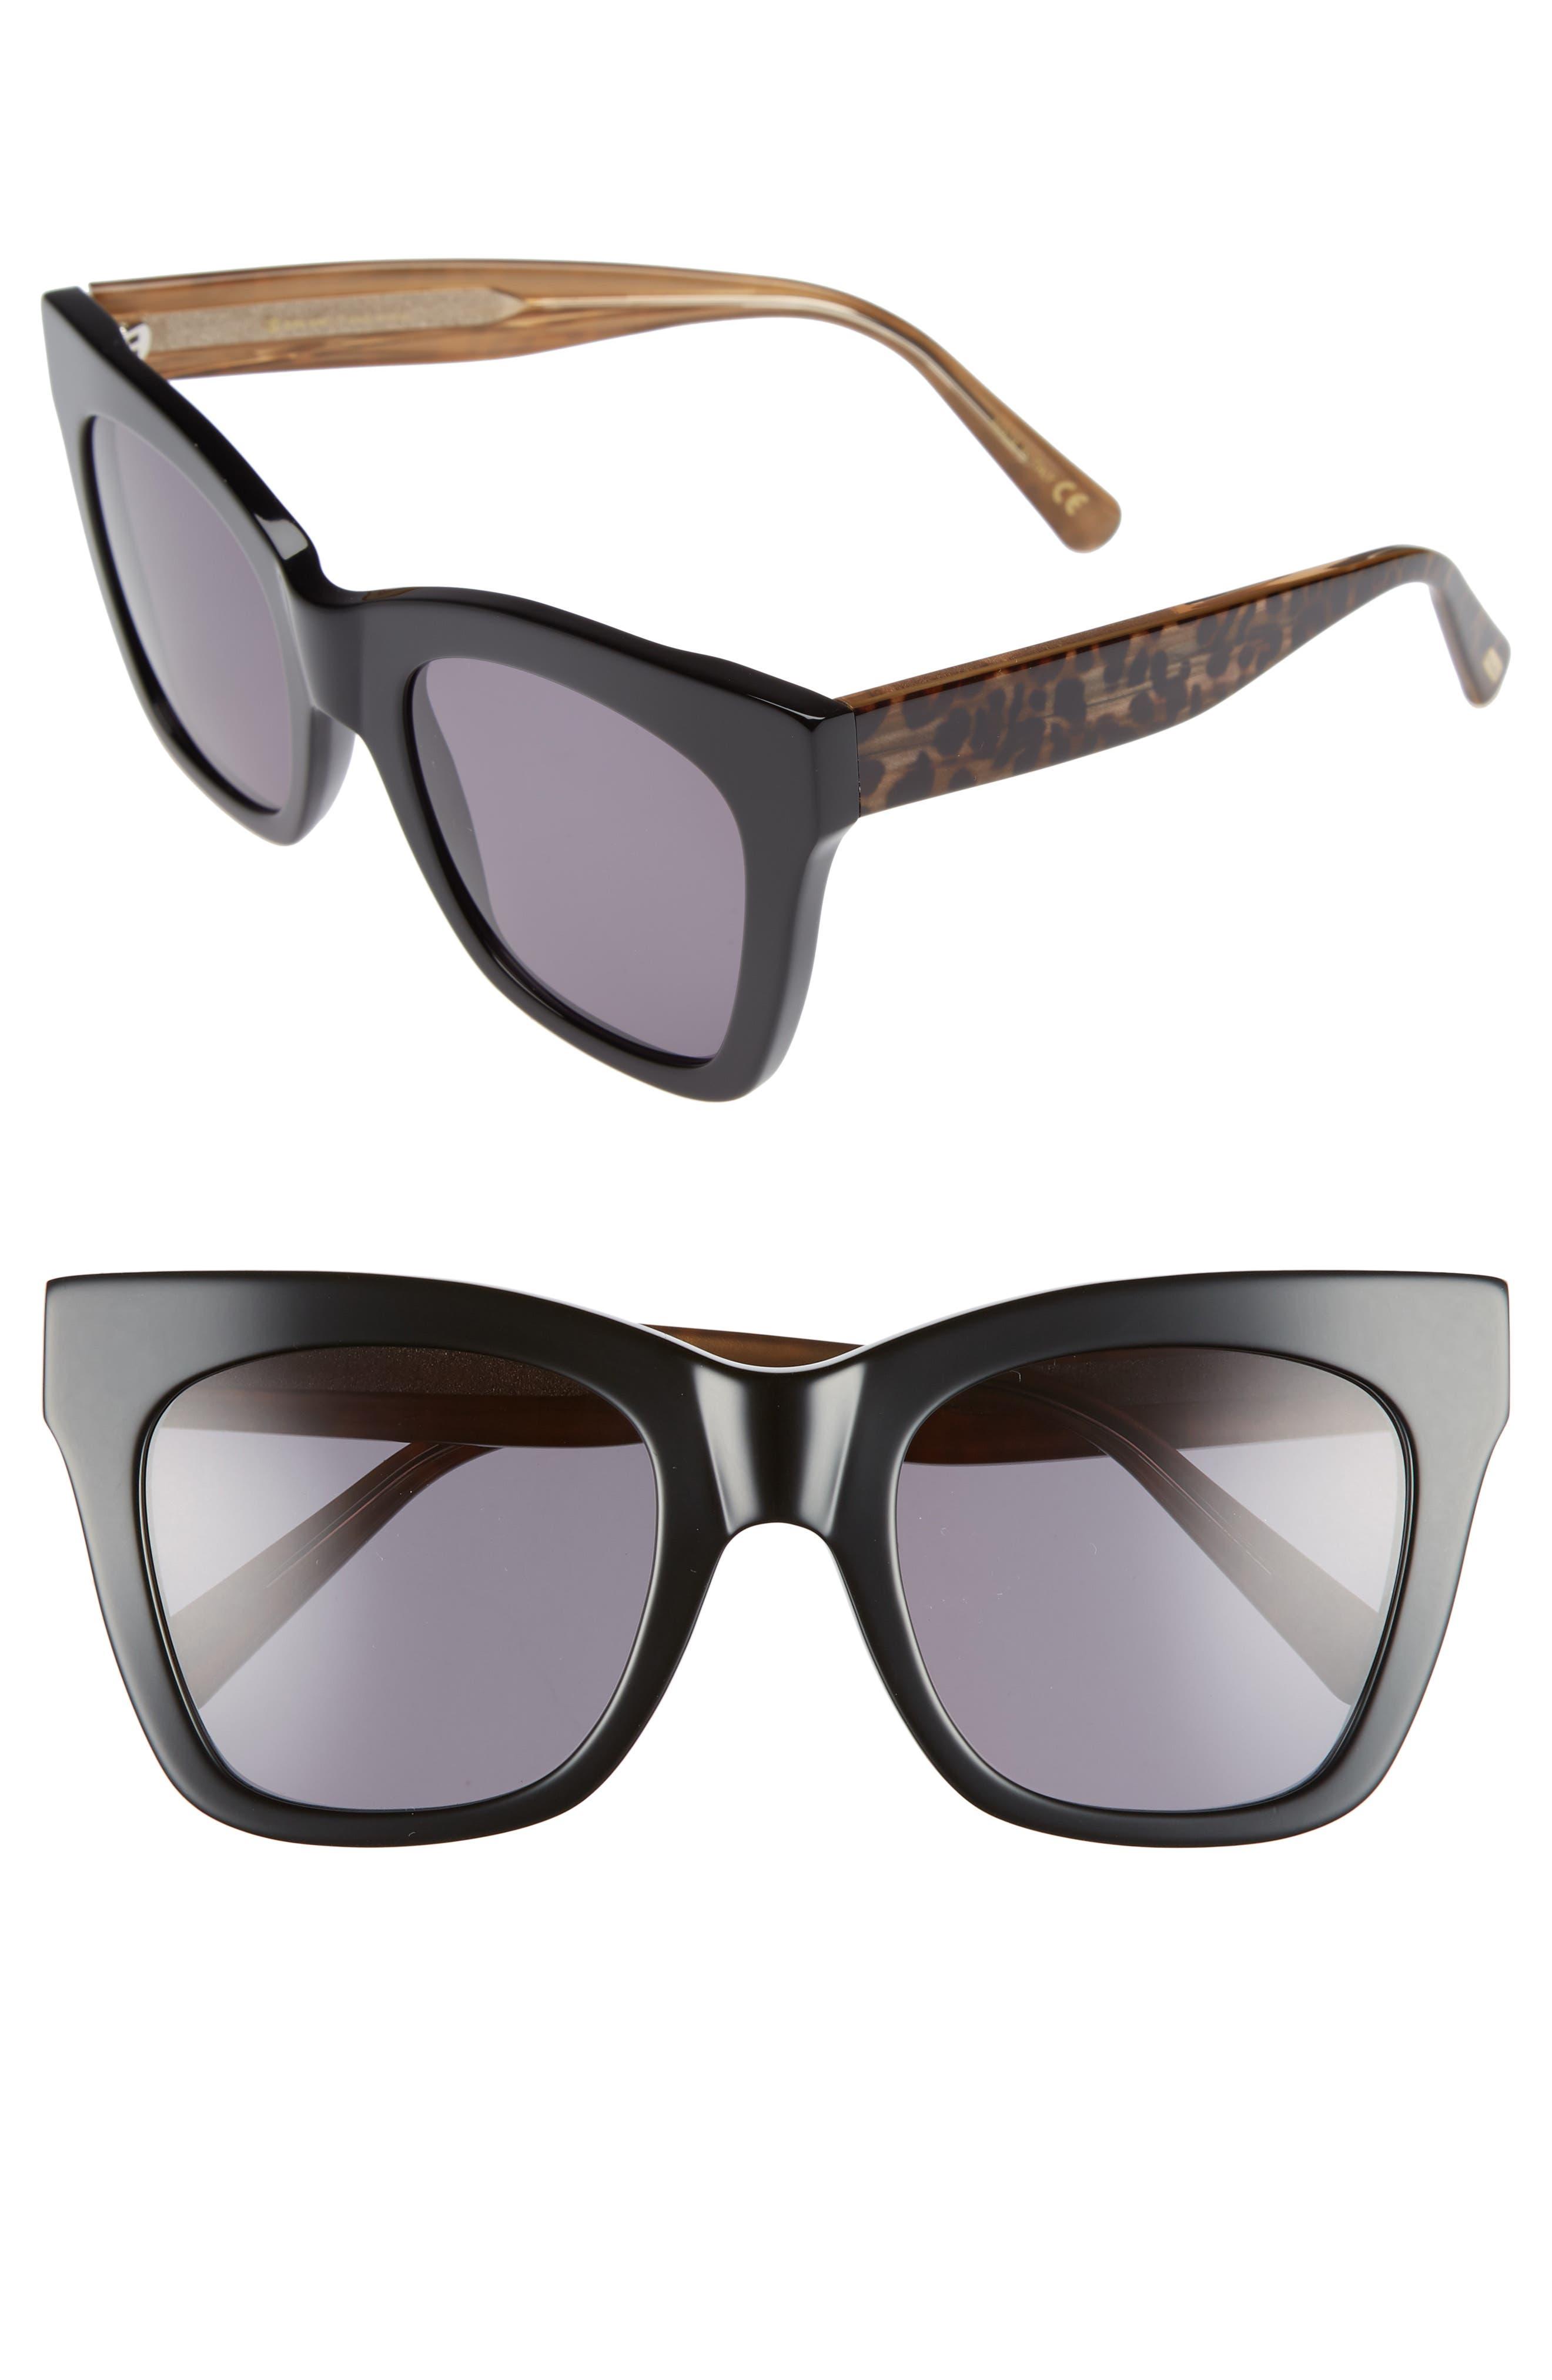 D'BLANC Beach Vida 52mm Sunglasses,                         Main,                         color, BLACK CHEETAH/ GREY